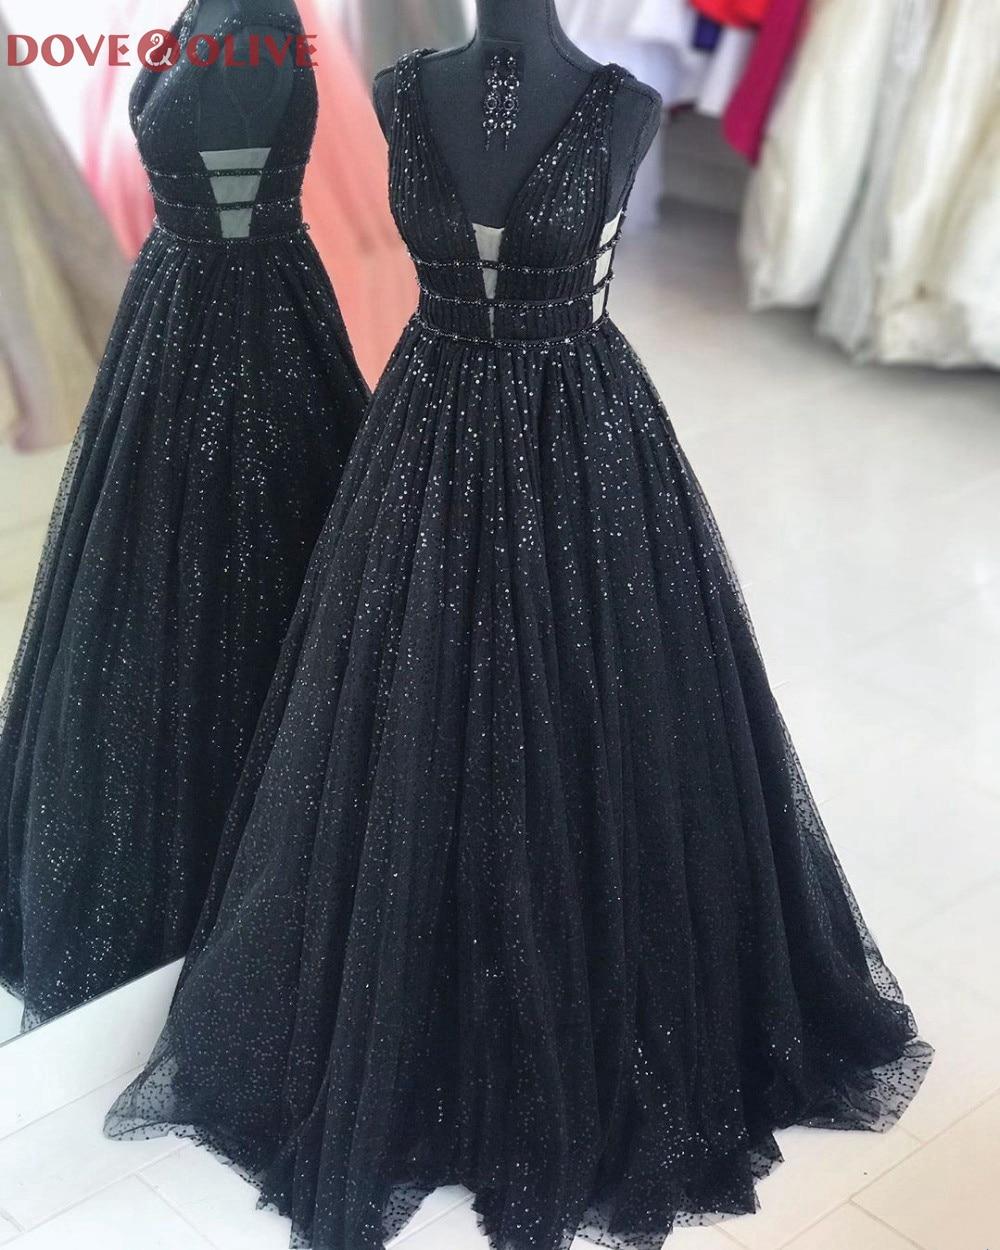 Sexy V Neck Sequined Black Long A-Line Beaded Prom Dresses Elegant Women Sleeveless vestidos de fiesta Formal Party Evening Gown